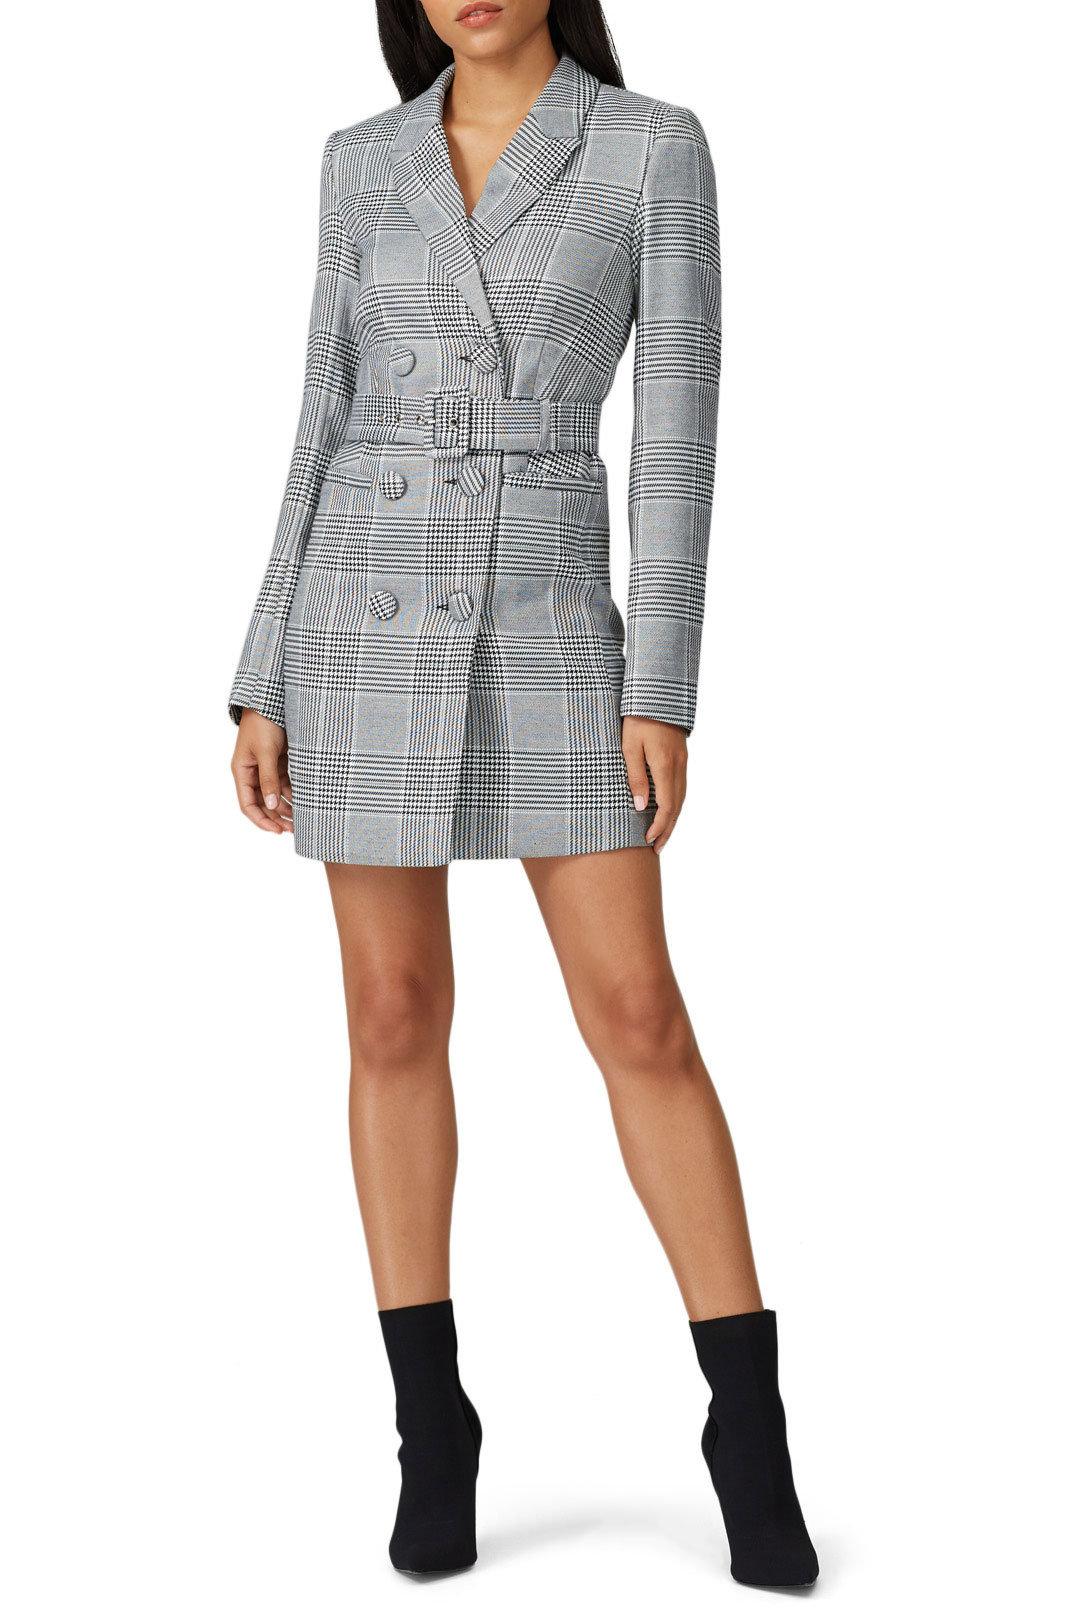 BARDOT - Plaid Blazer Dress